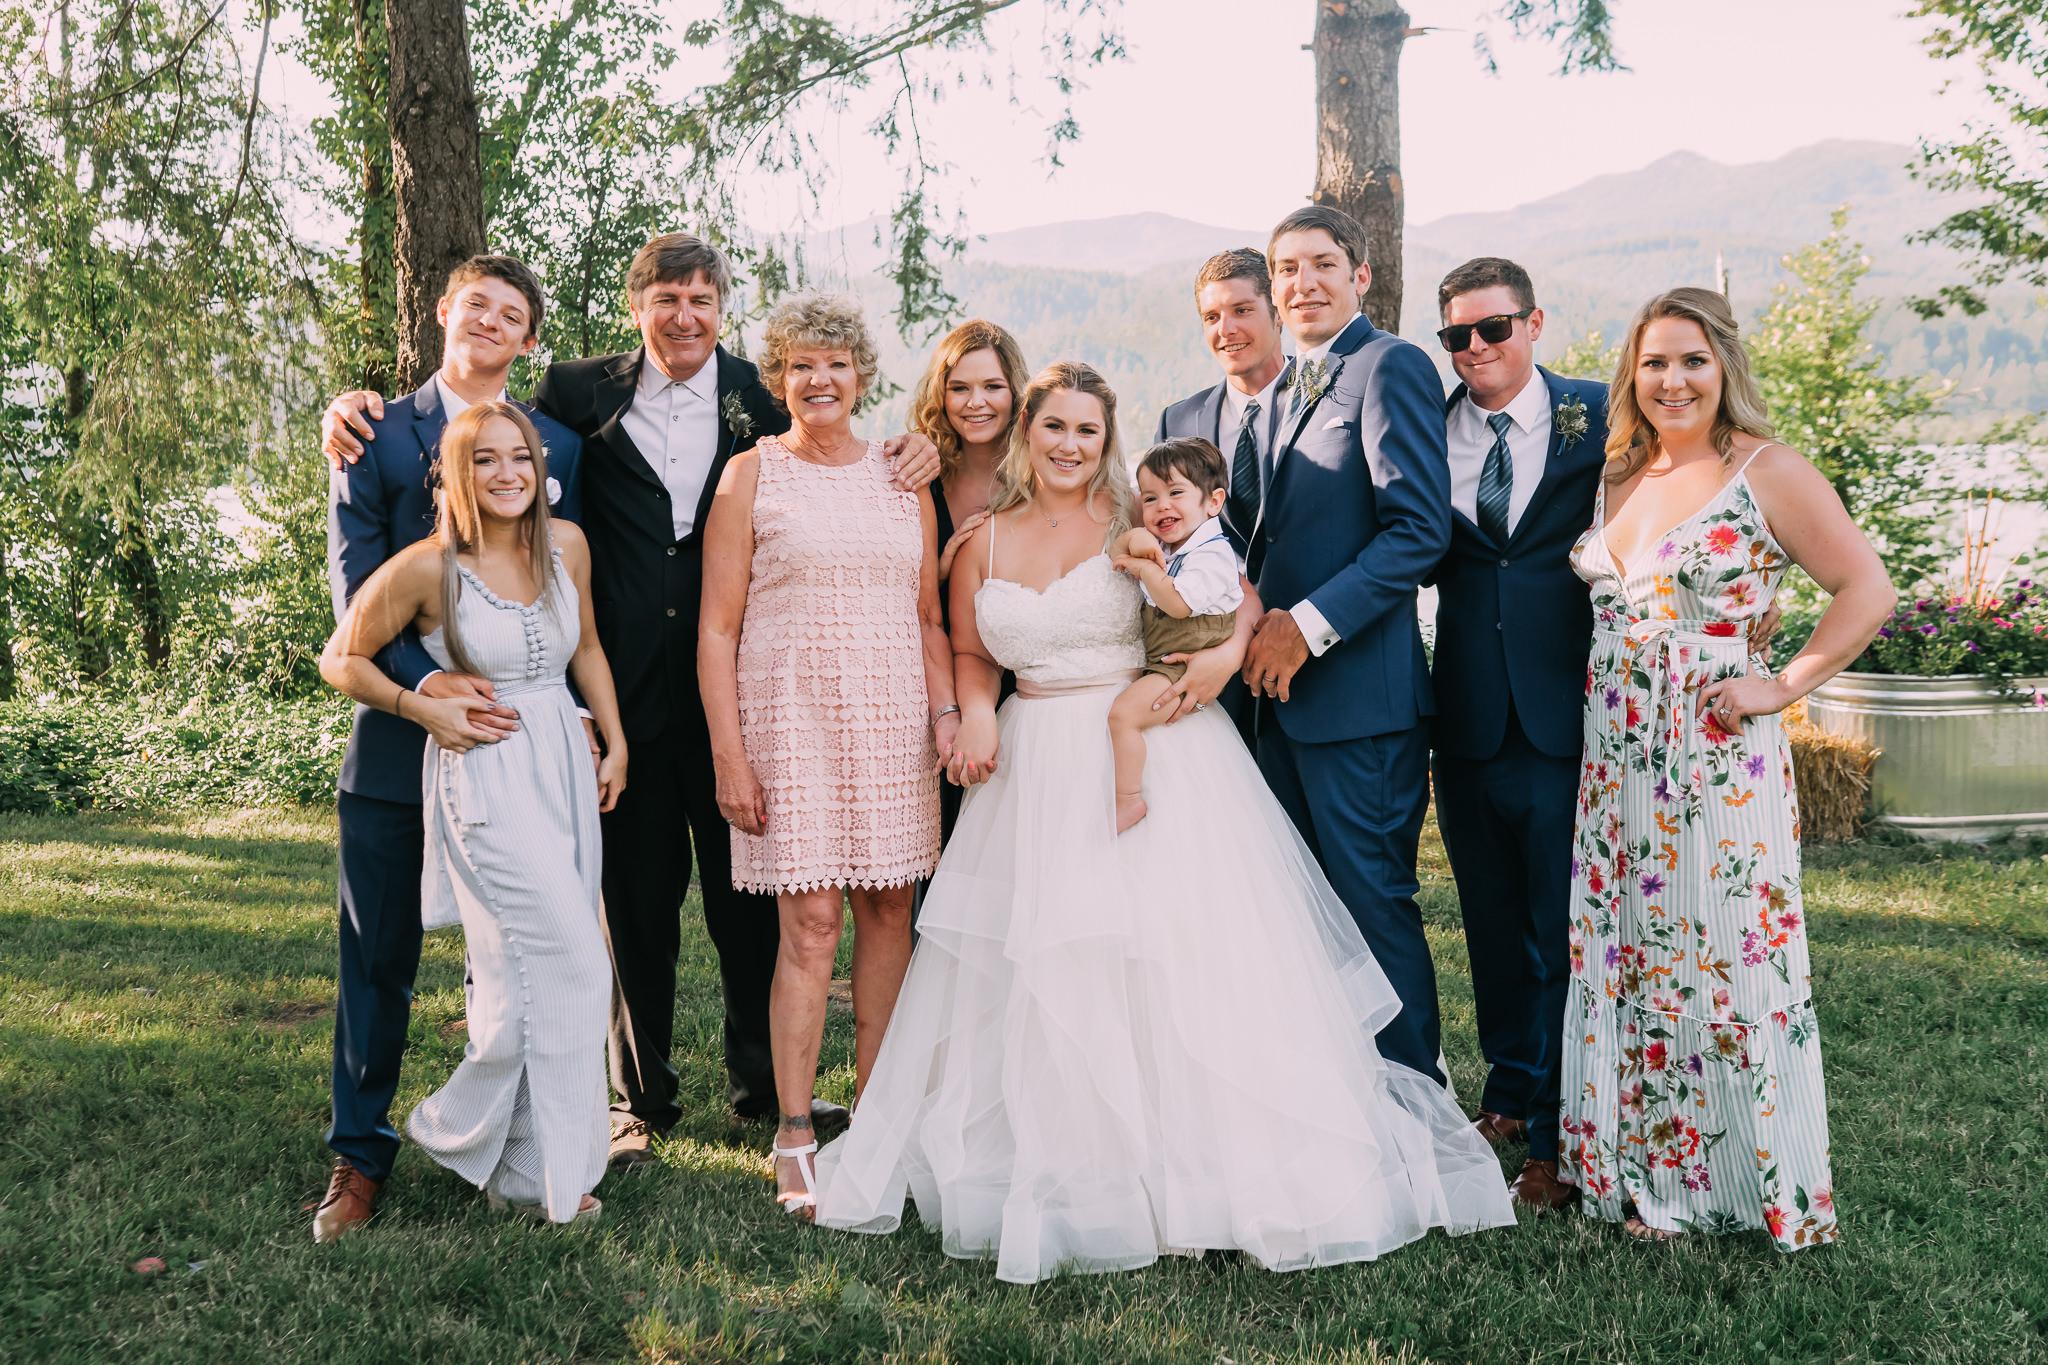 Bride family group formal wedding photo Portland Oregon